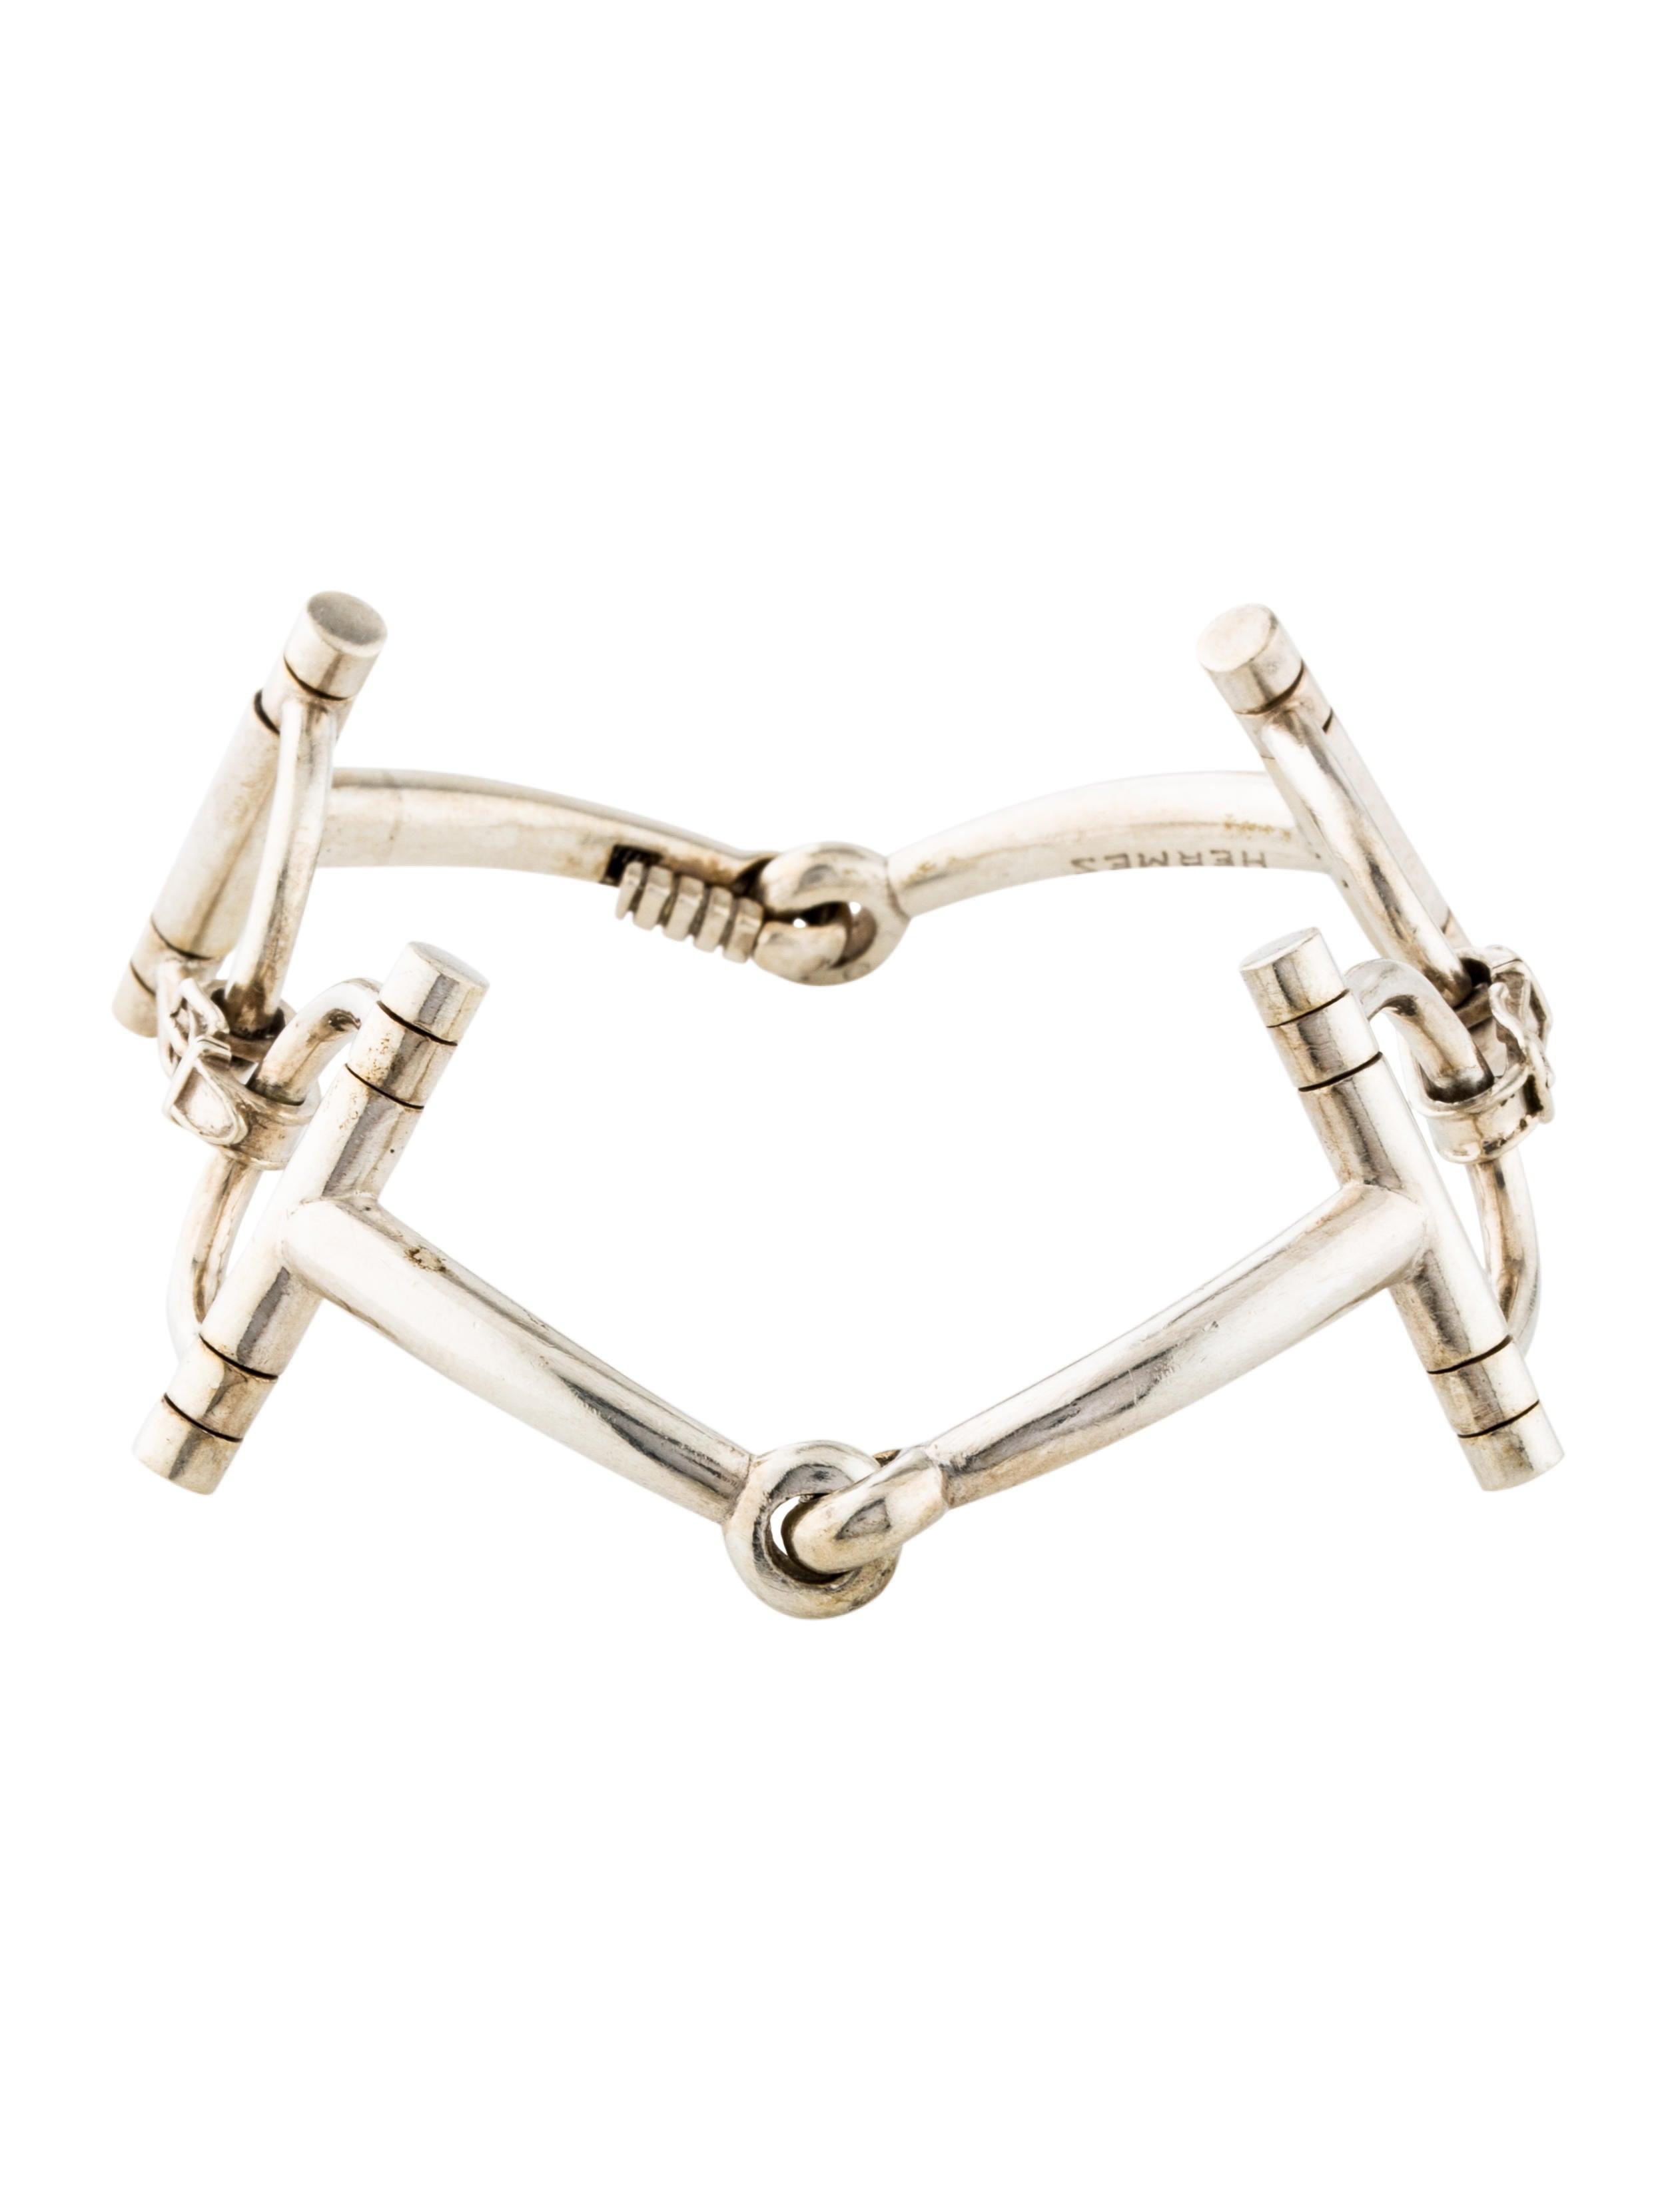 041420dbe Hermès Vintage Filet de Selle Horse Bit Bracelet - Bracelets ...